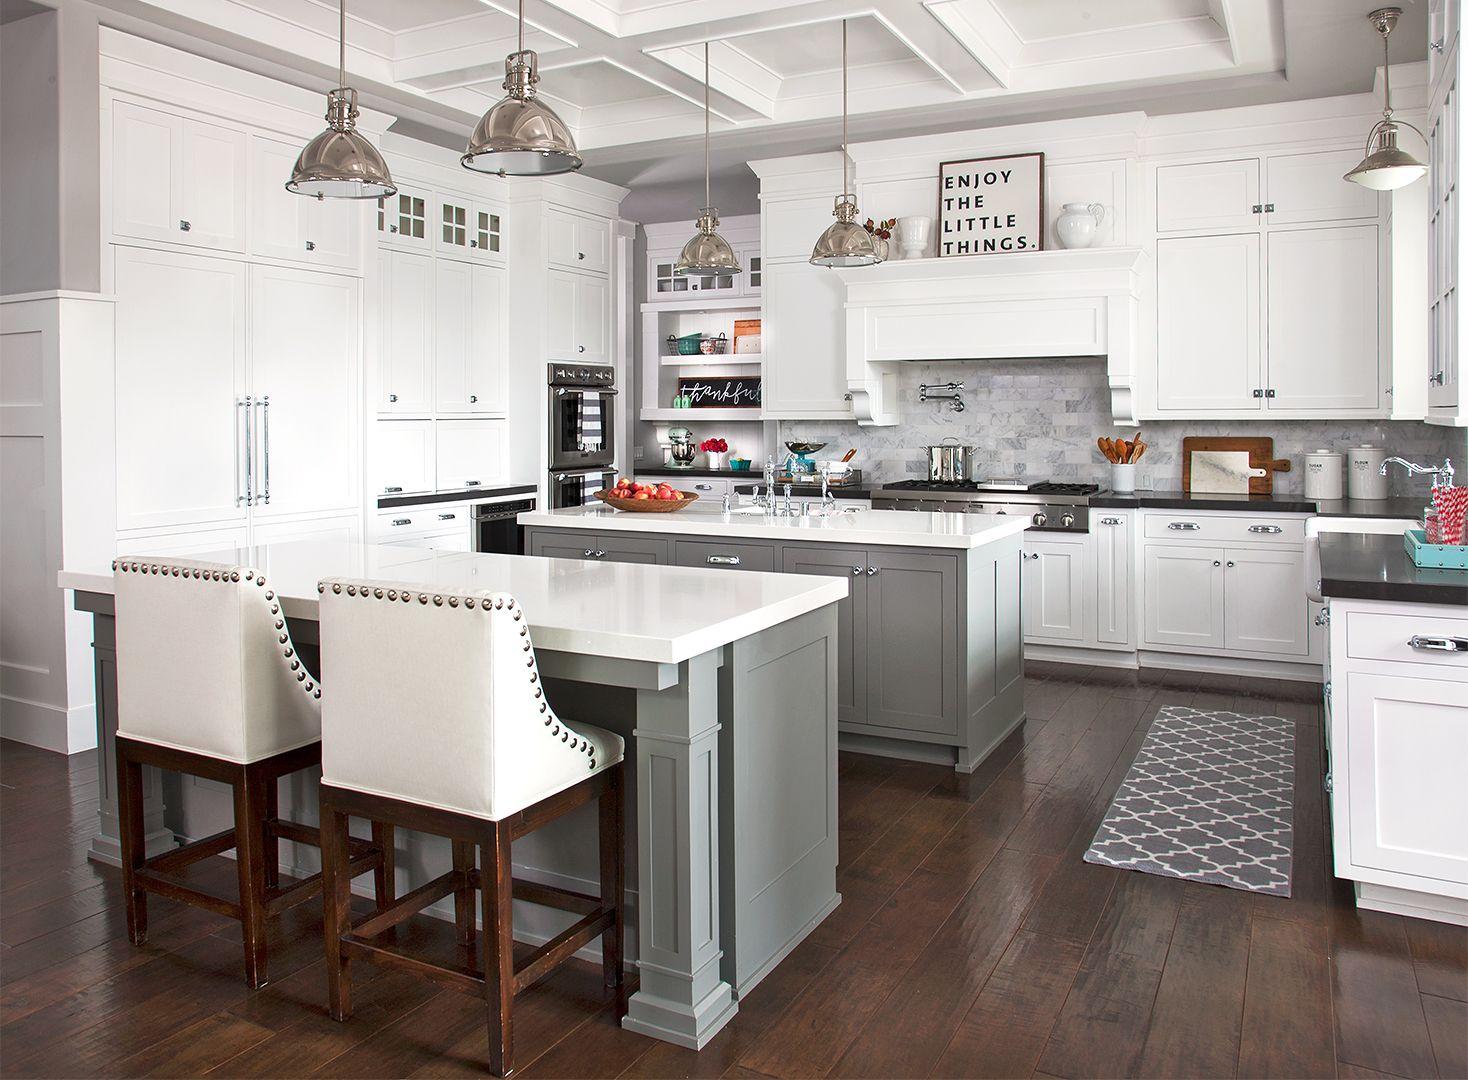 This Dreamy Family Kitchen Is A Storage Oasis Simple Kitchen Remodel Kitchen Remodel Kitchen Renovation White house family kitchen